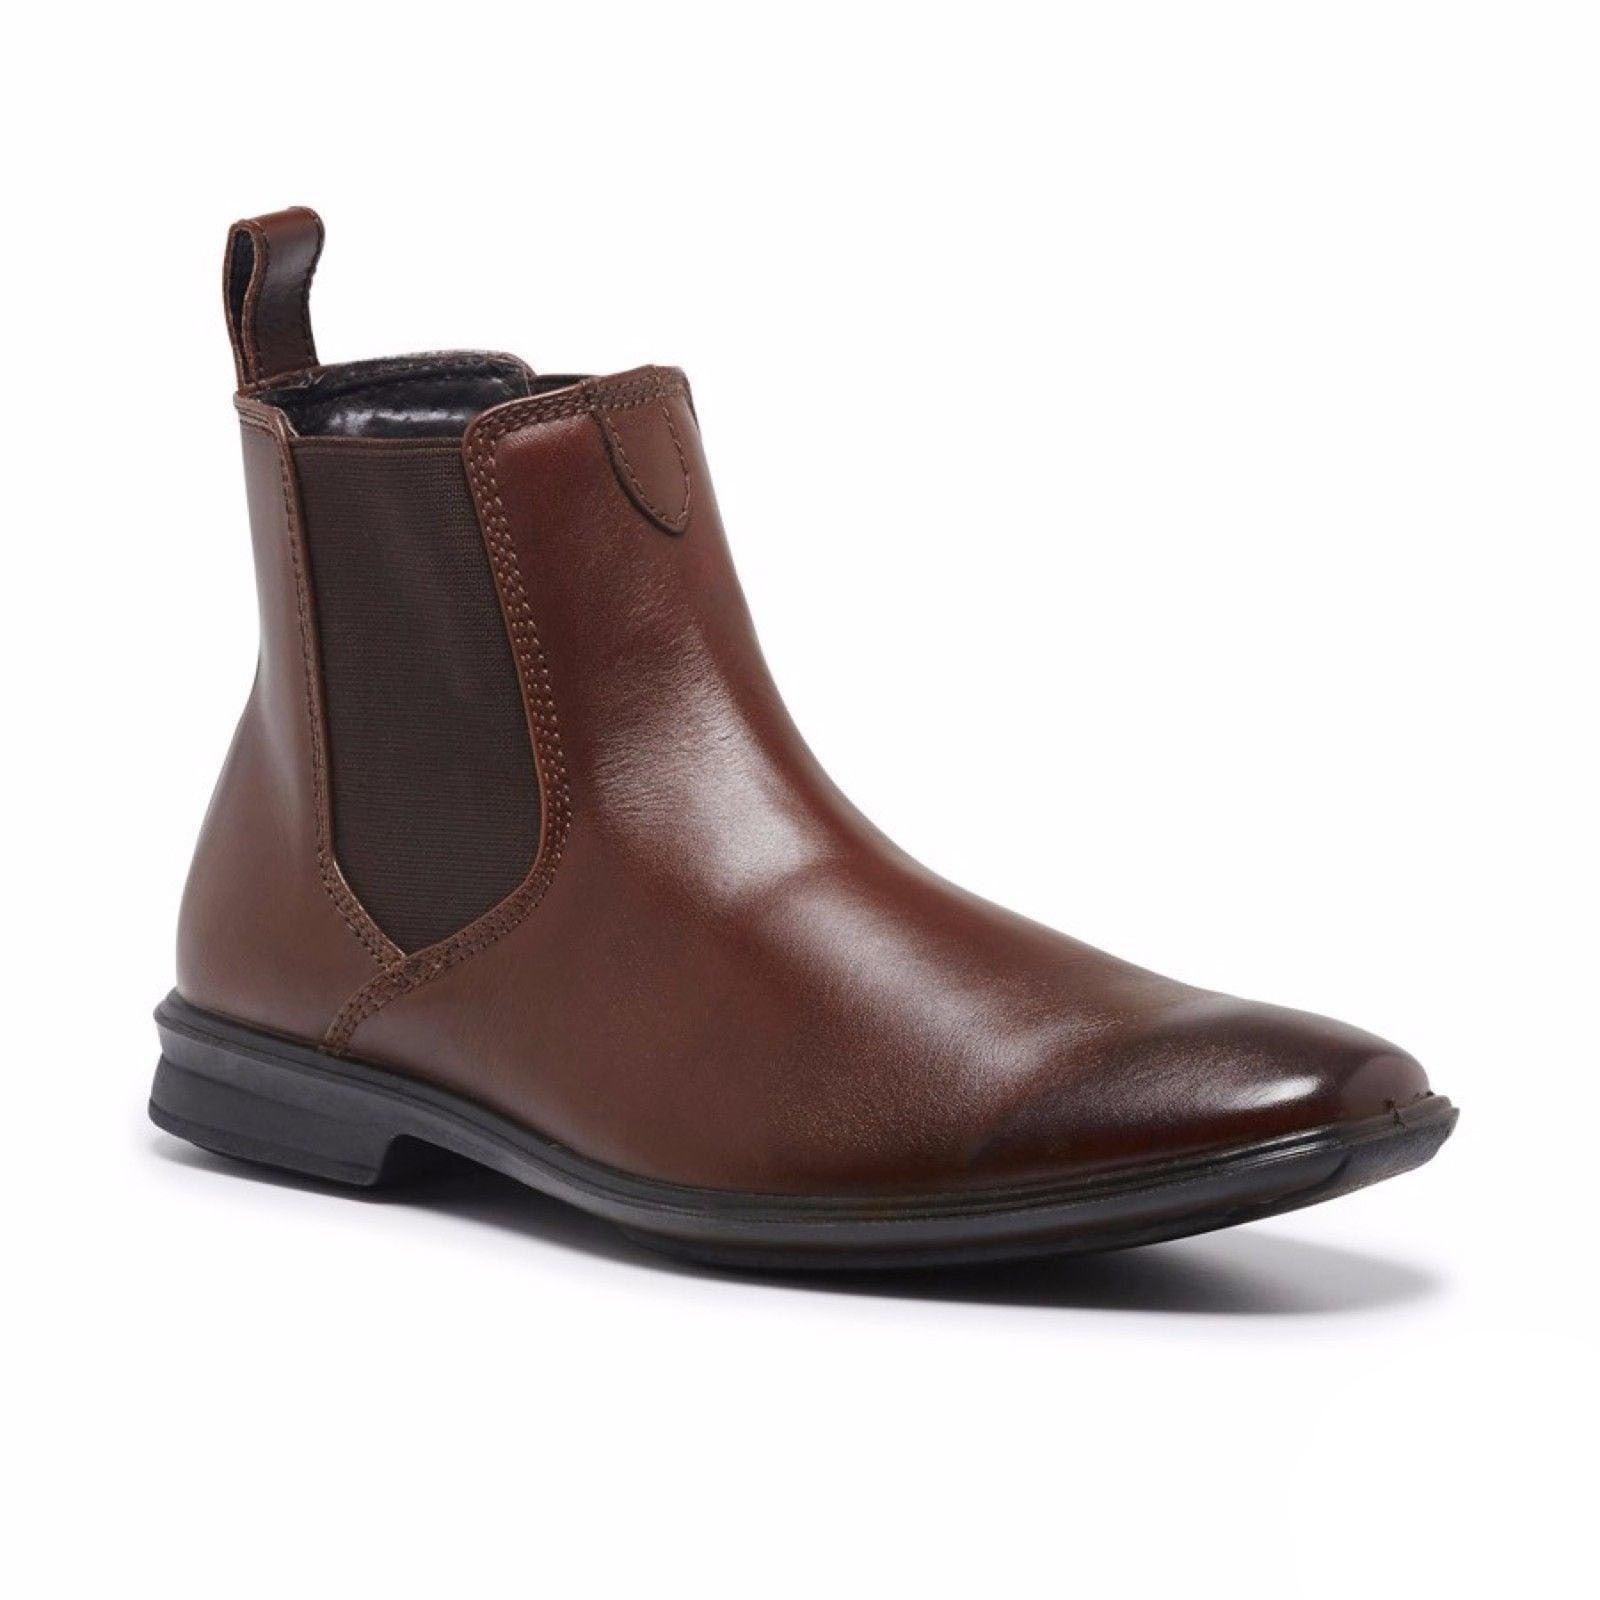 Men's HUSH PUPPIES CHELSEA Leather